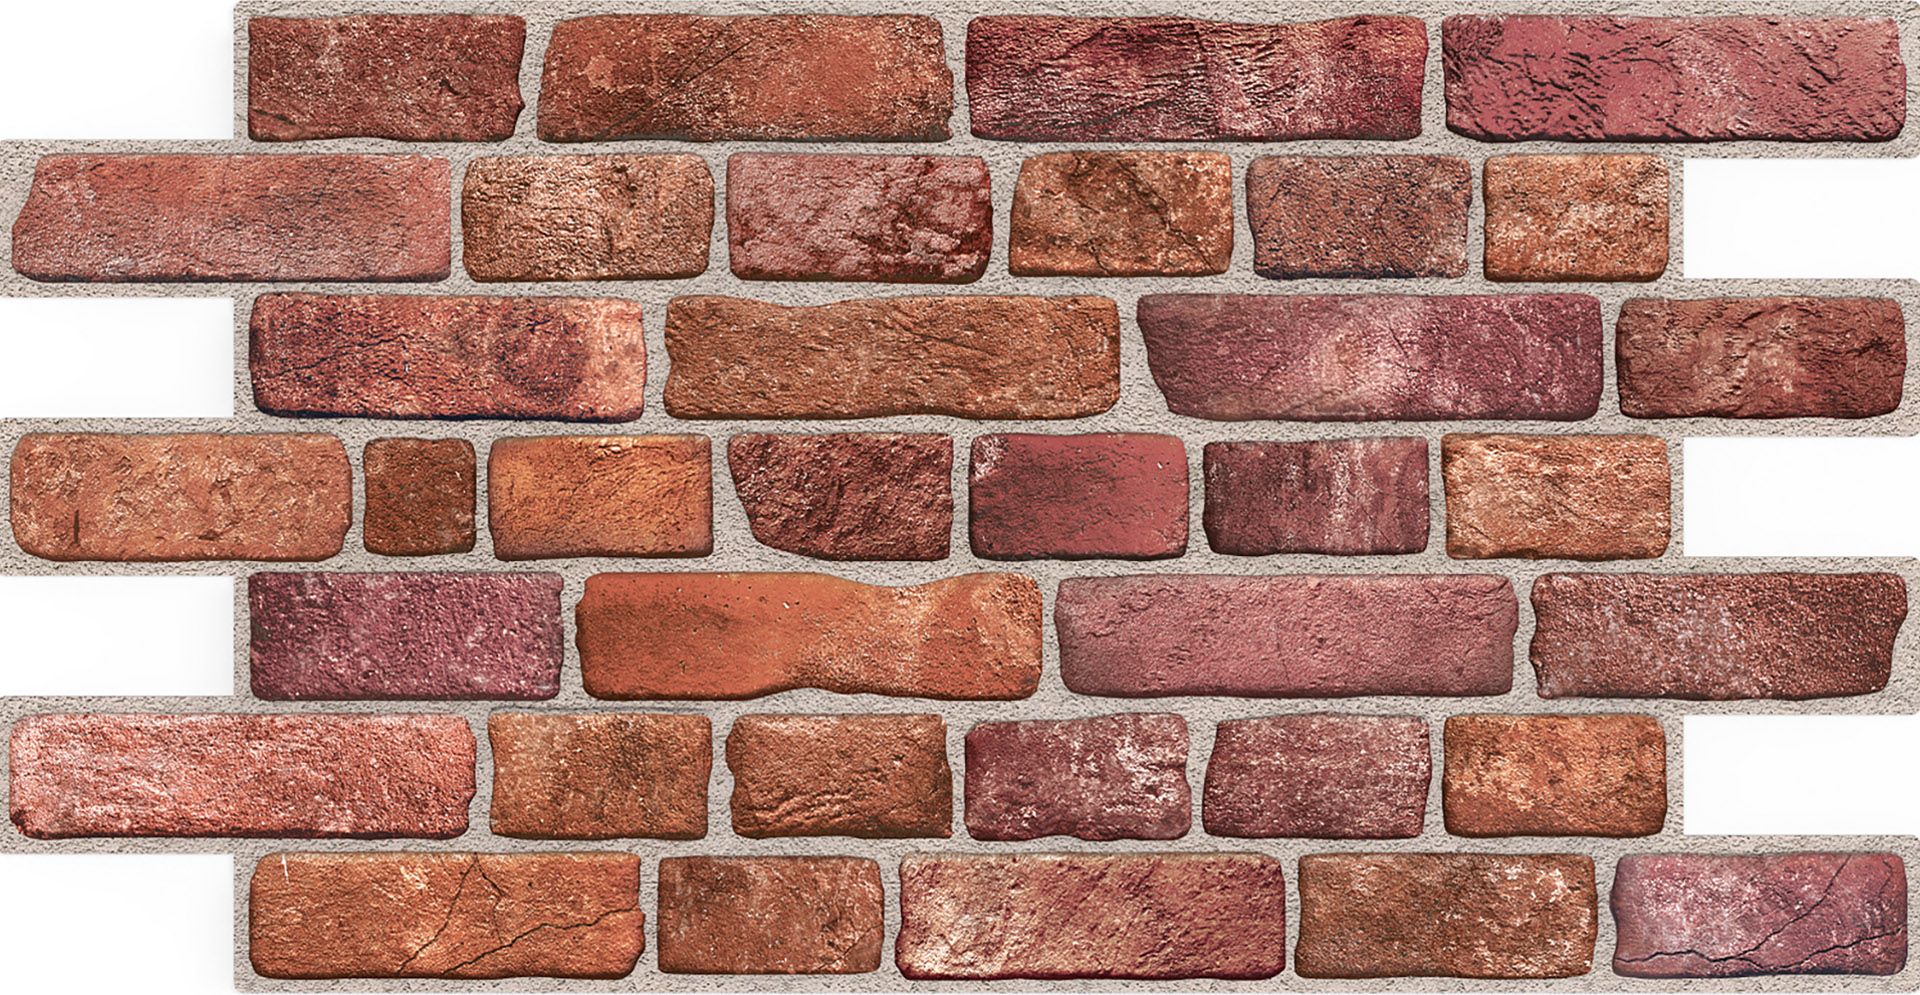 Dekor Paneele | Ziegel | Wand | Platte | PVC | stabil | 95x50cm | Regul